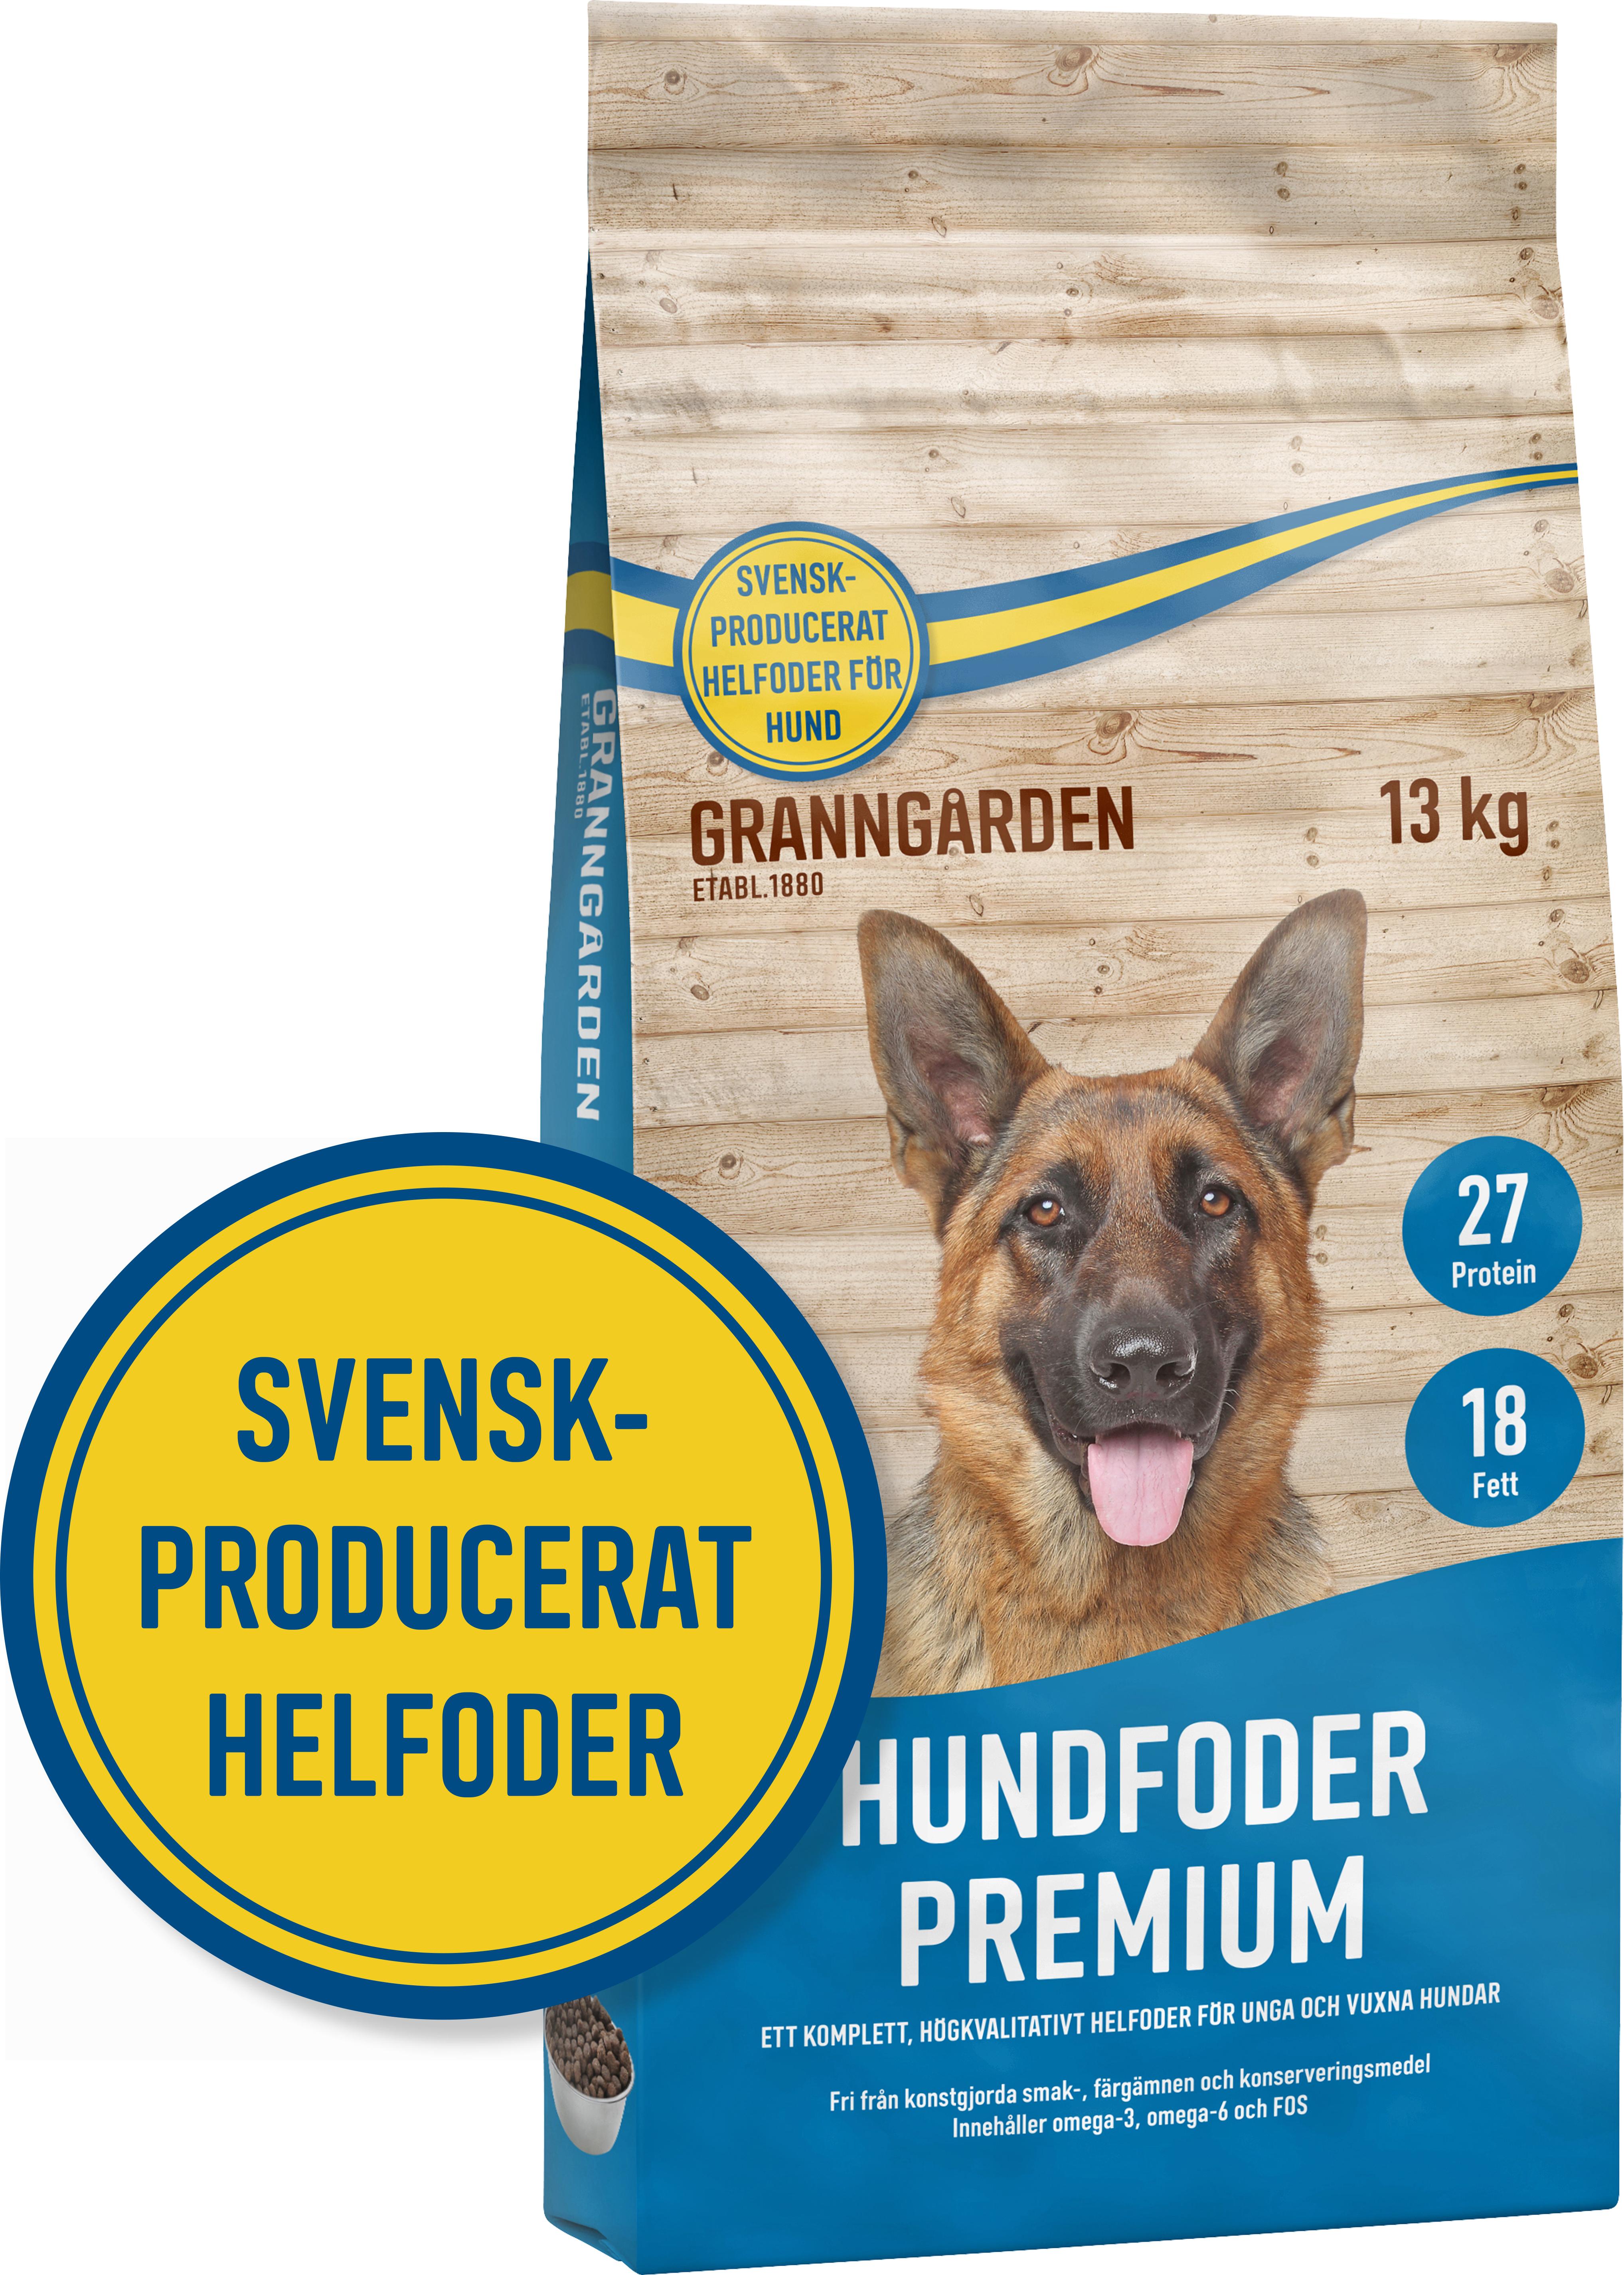 Hundfoder Granngården Premium, 13 kg